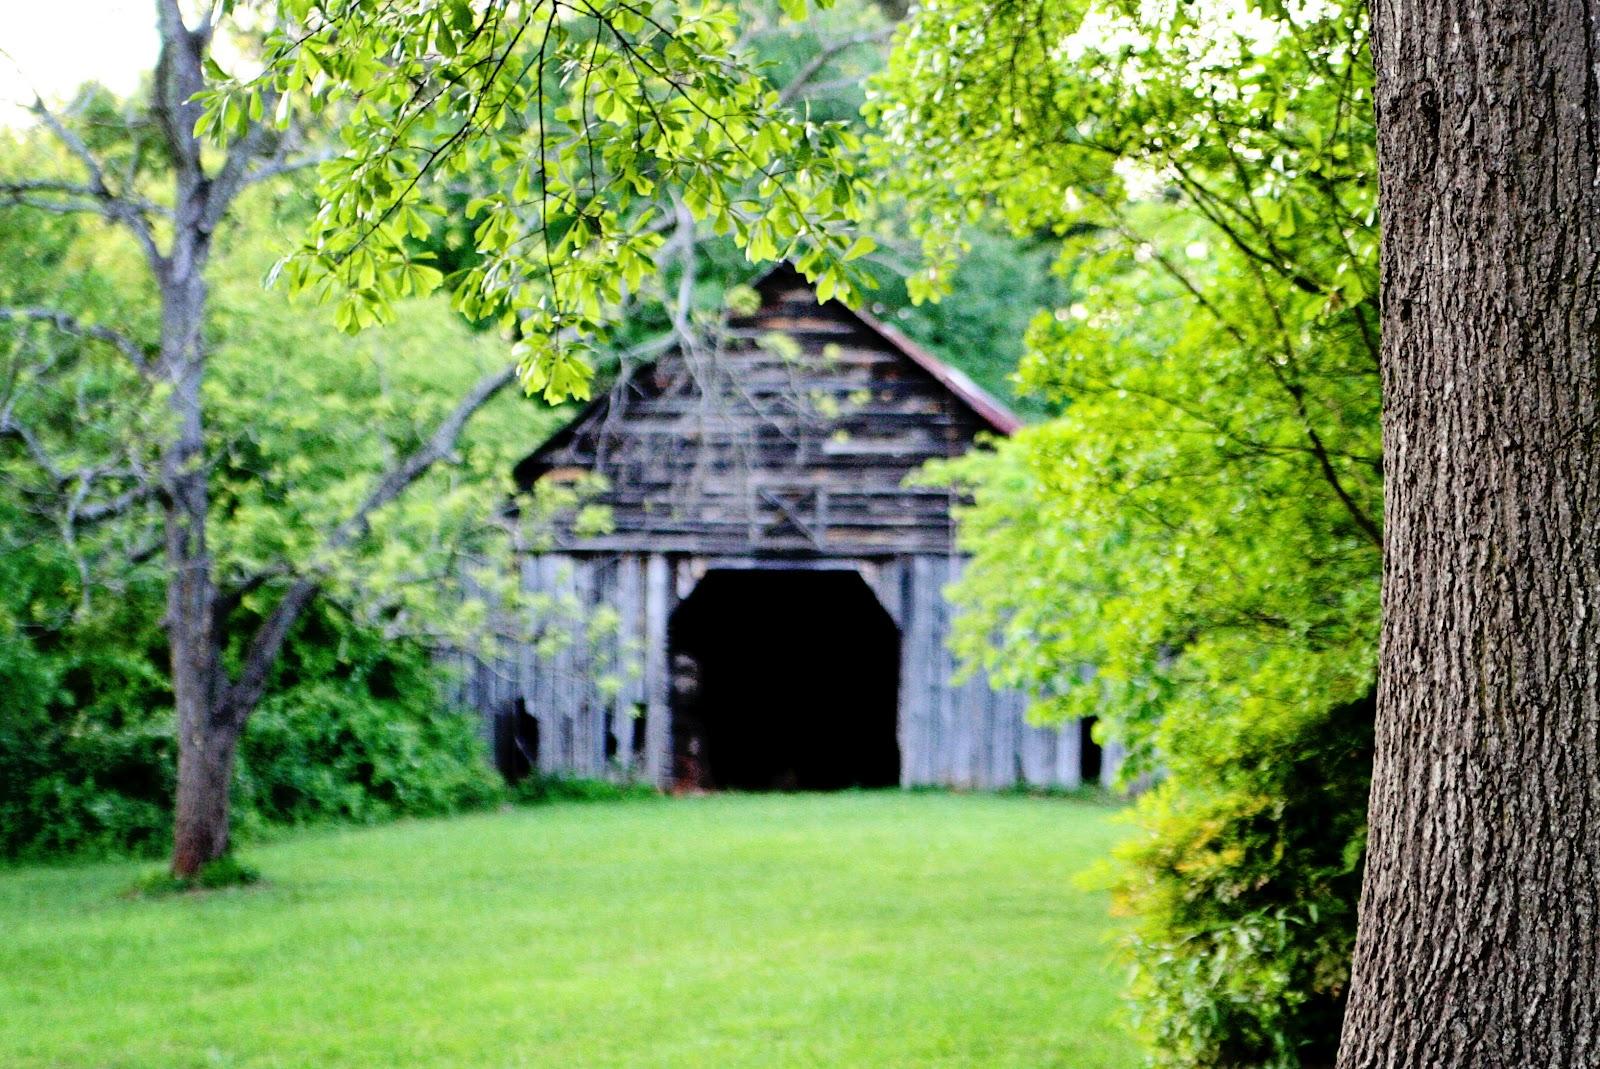 http://3.bp.blogspot.com/-hrdIZT2Y3aw/T4b6R8rXOKI/AAAAAAAASNI/0CYT9pDyVaI/s1600/simple+barn.jpg